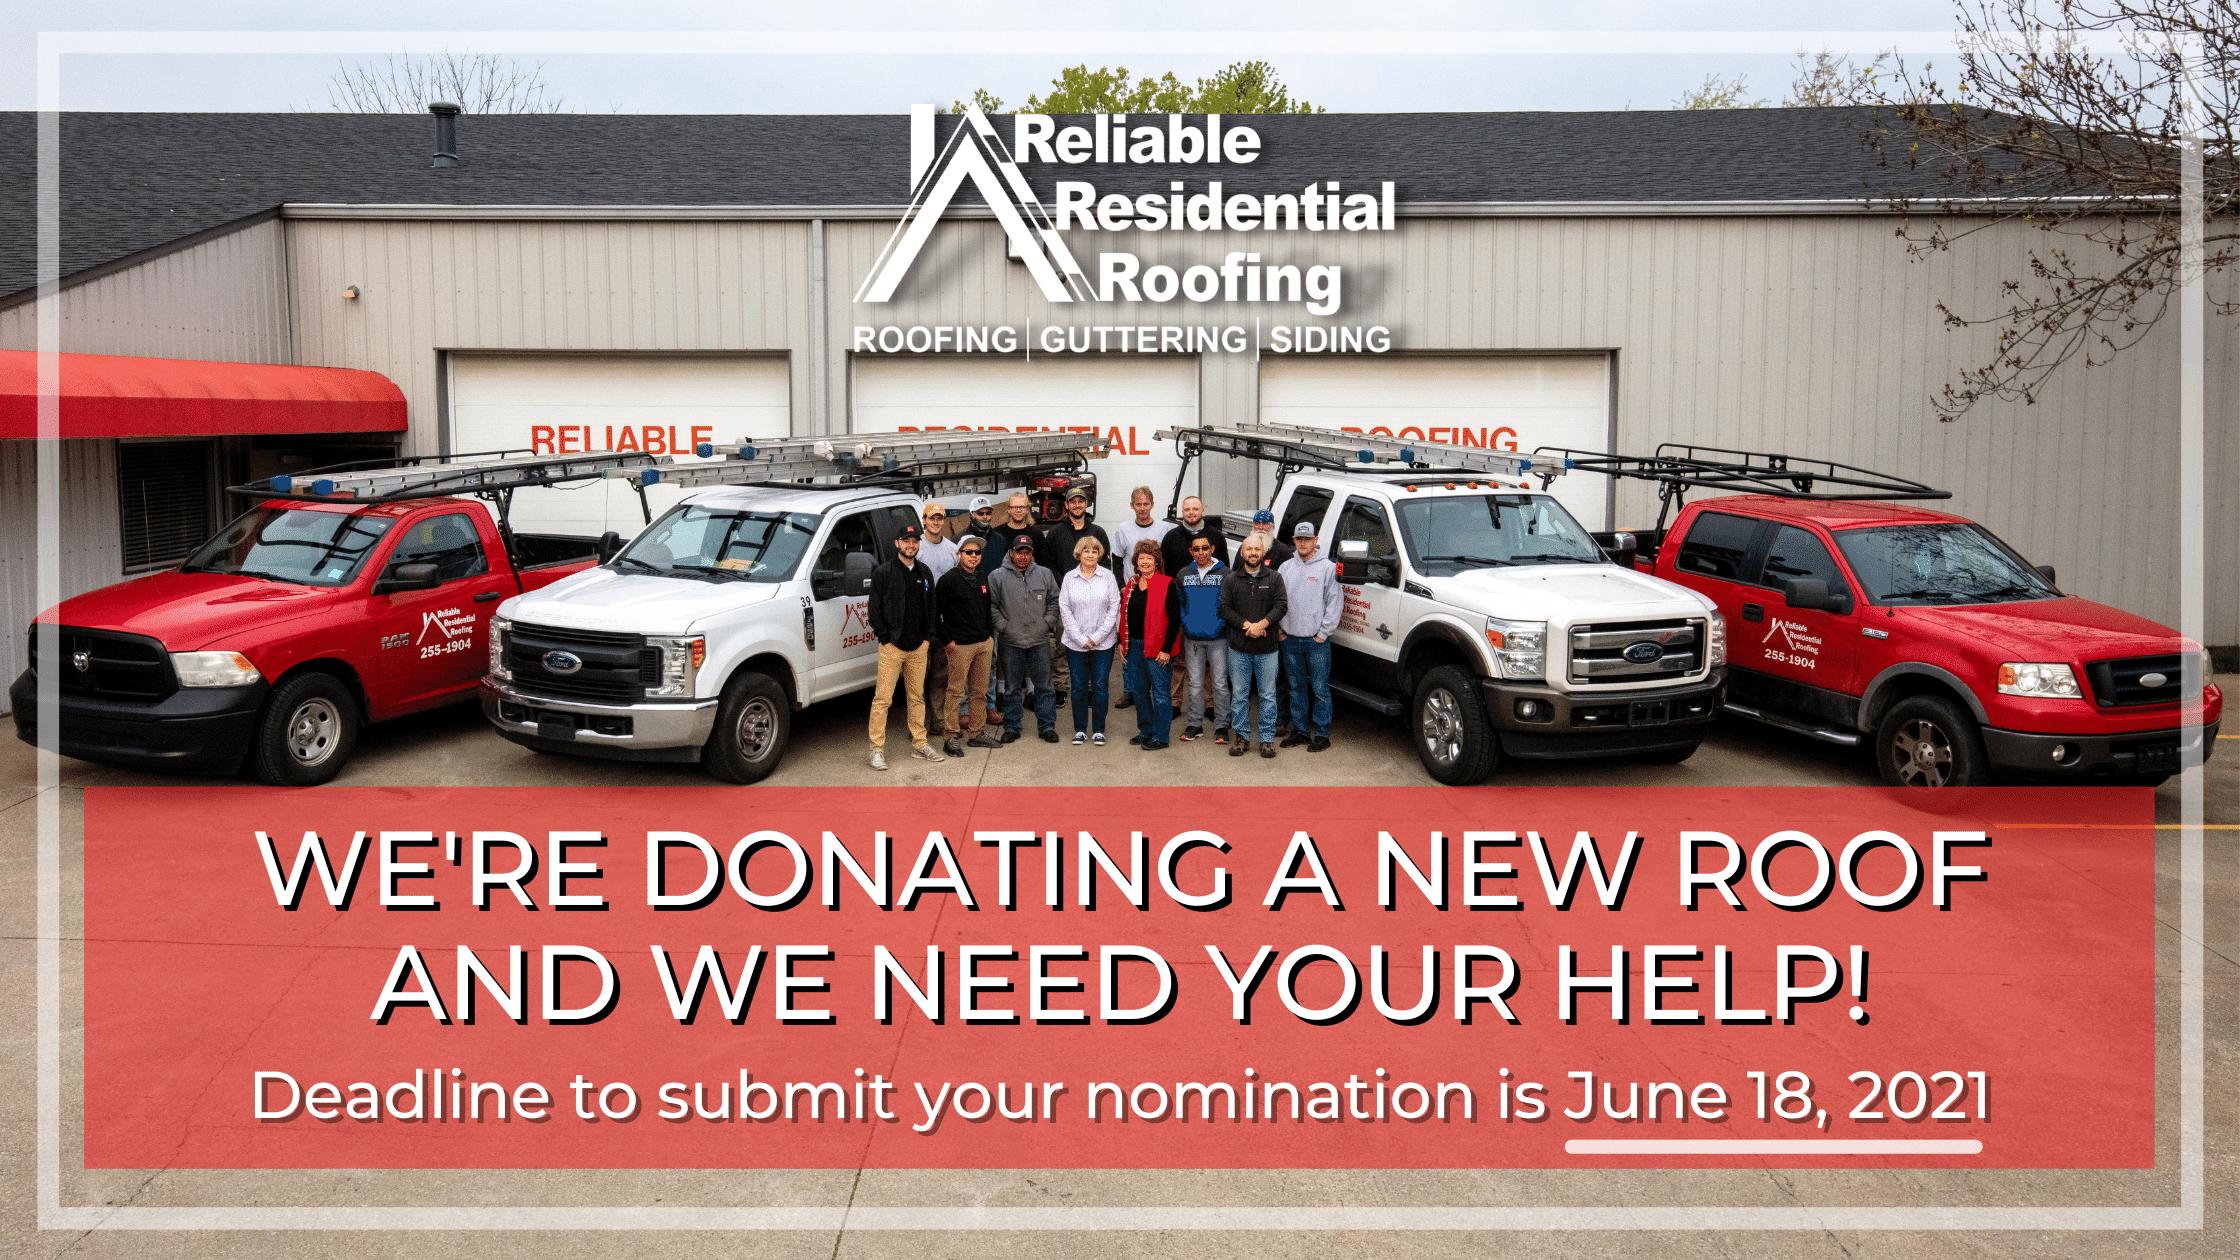 RRR Roof Donation Banner